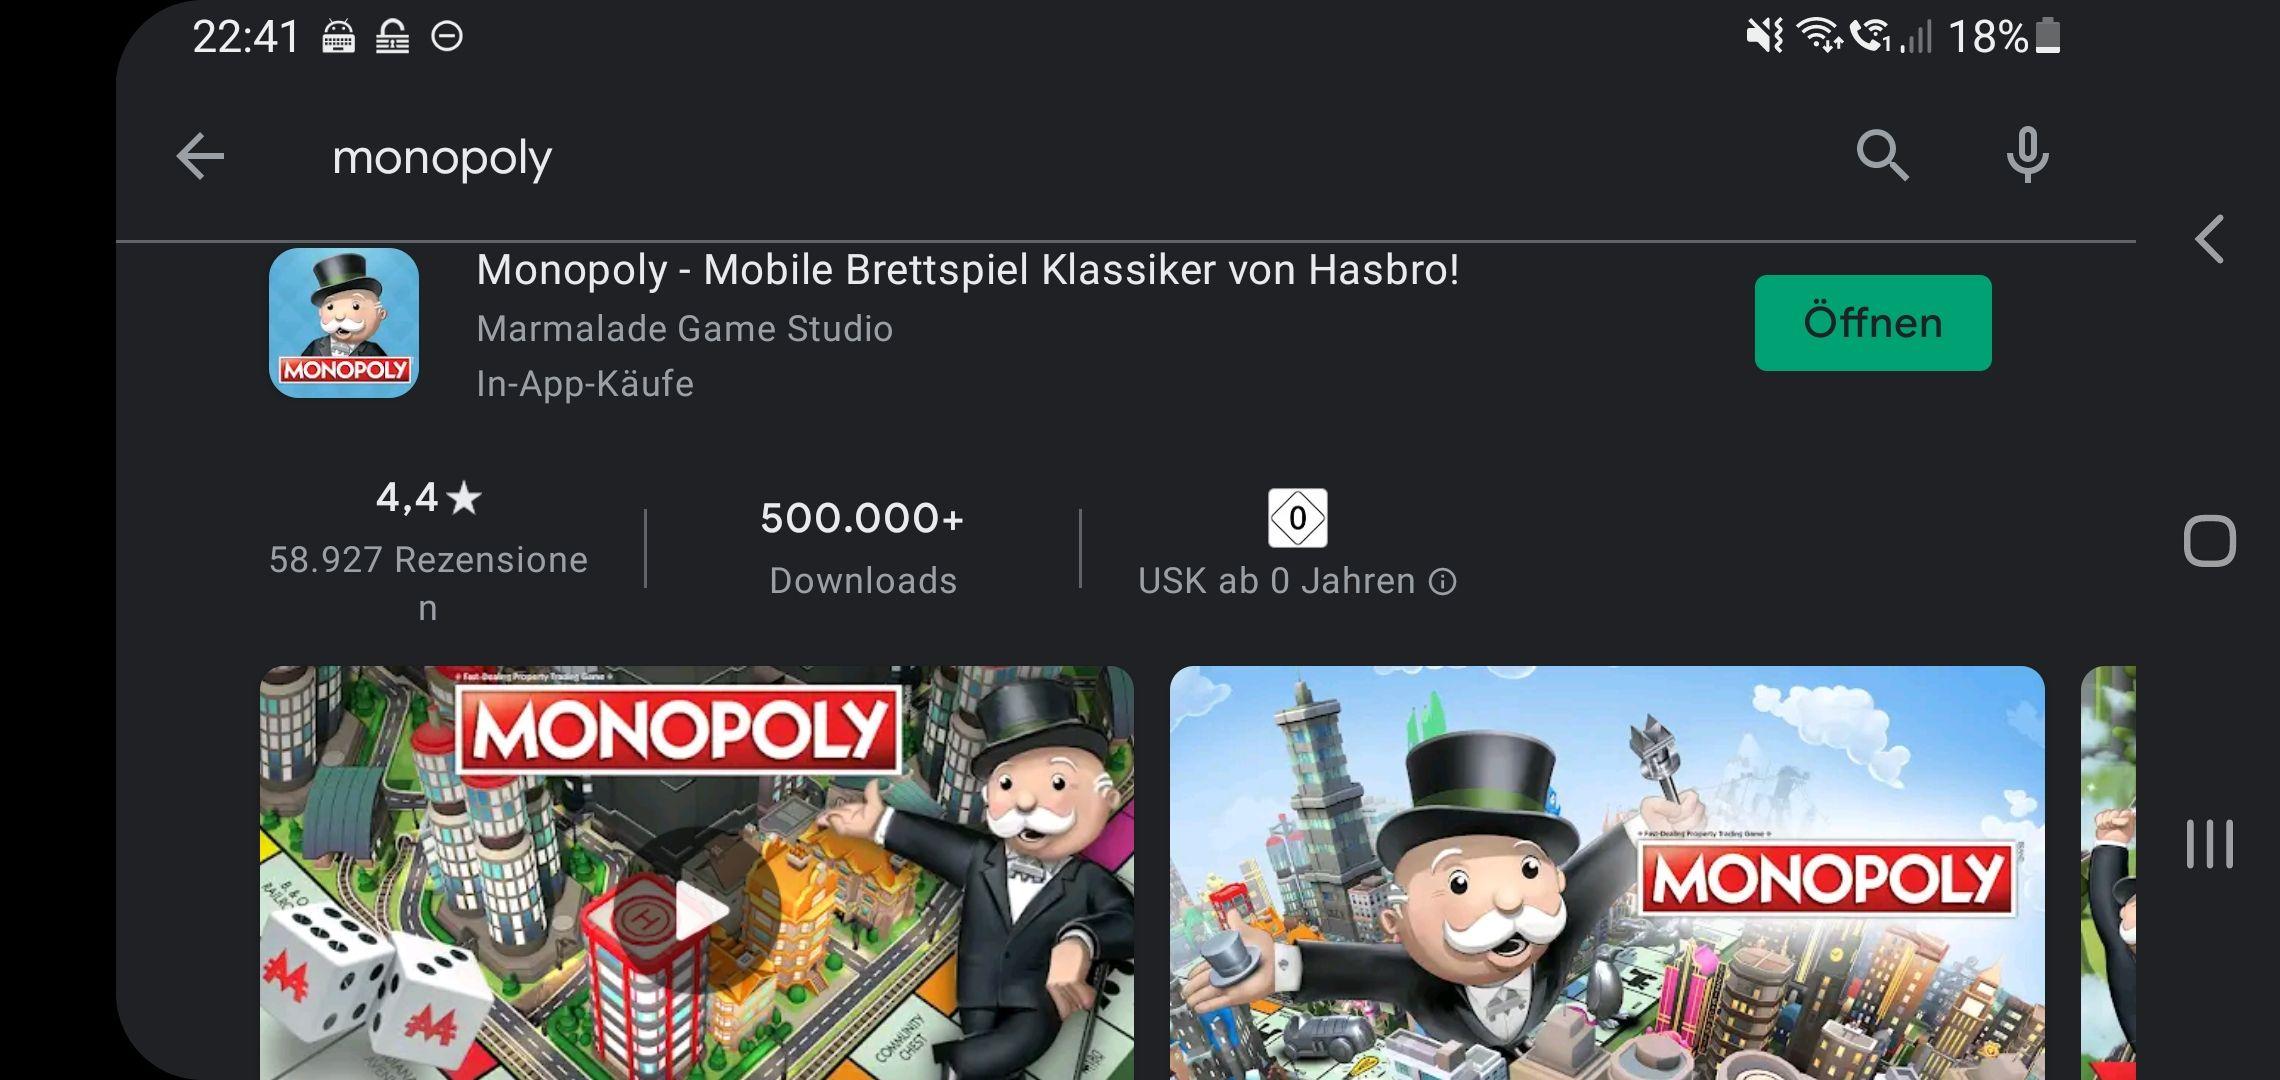 Monopoly App für 2,69 € statt 4,49 € (Google Play / Android) - Brettspiel-Animation